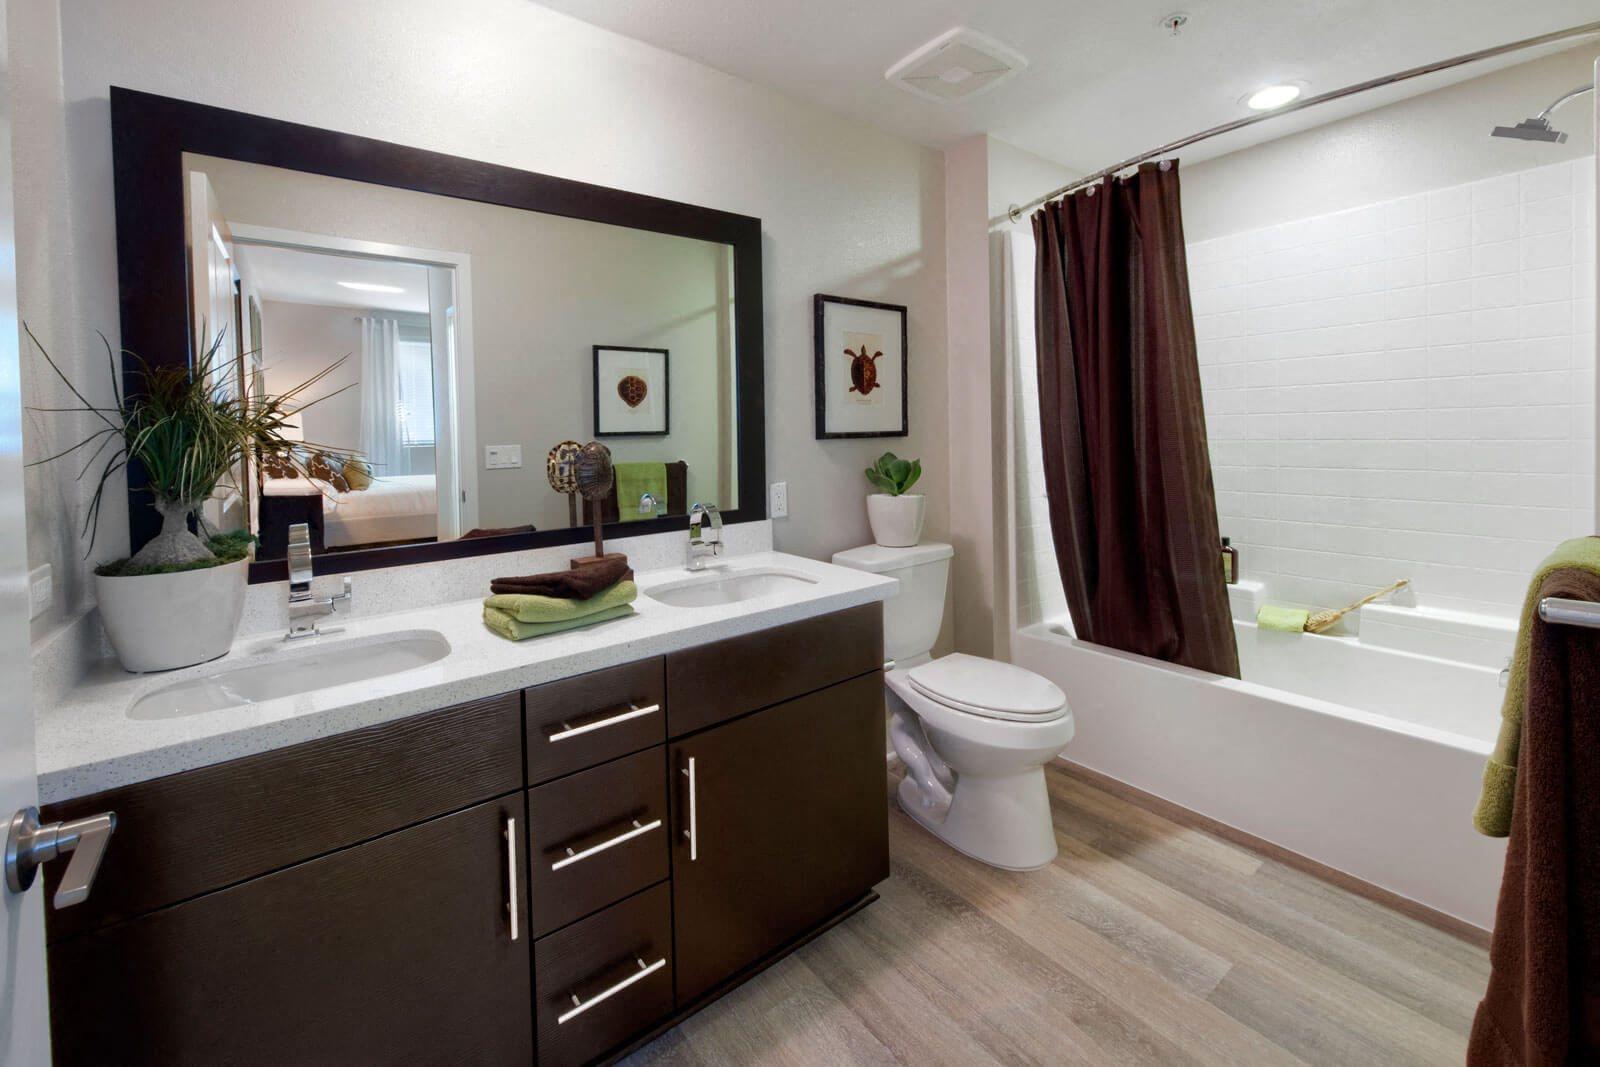 Spacious, Designer Bathrooms at Boardwalk by Windsor, 7461 Edinger Ave., Huntington Beach